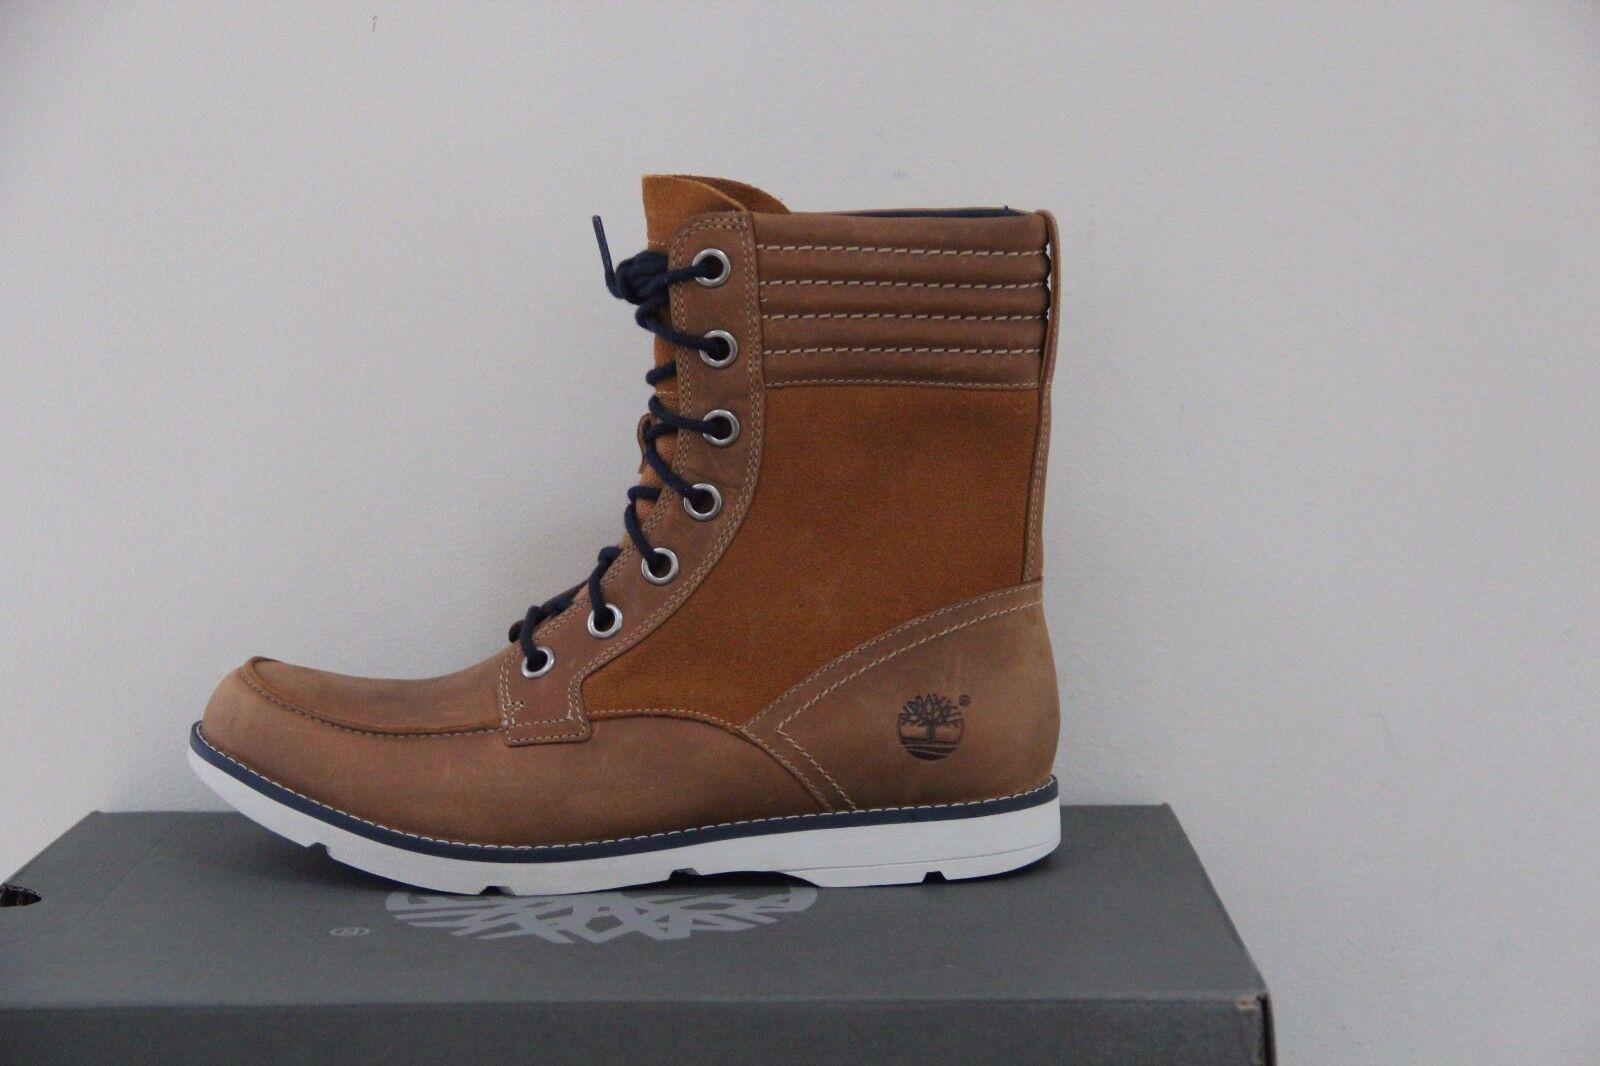 Timberland Women's Sumter 6 inch Boots NIB